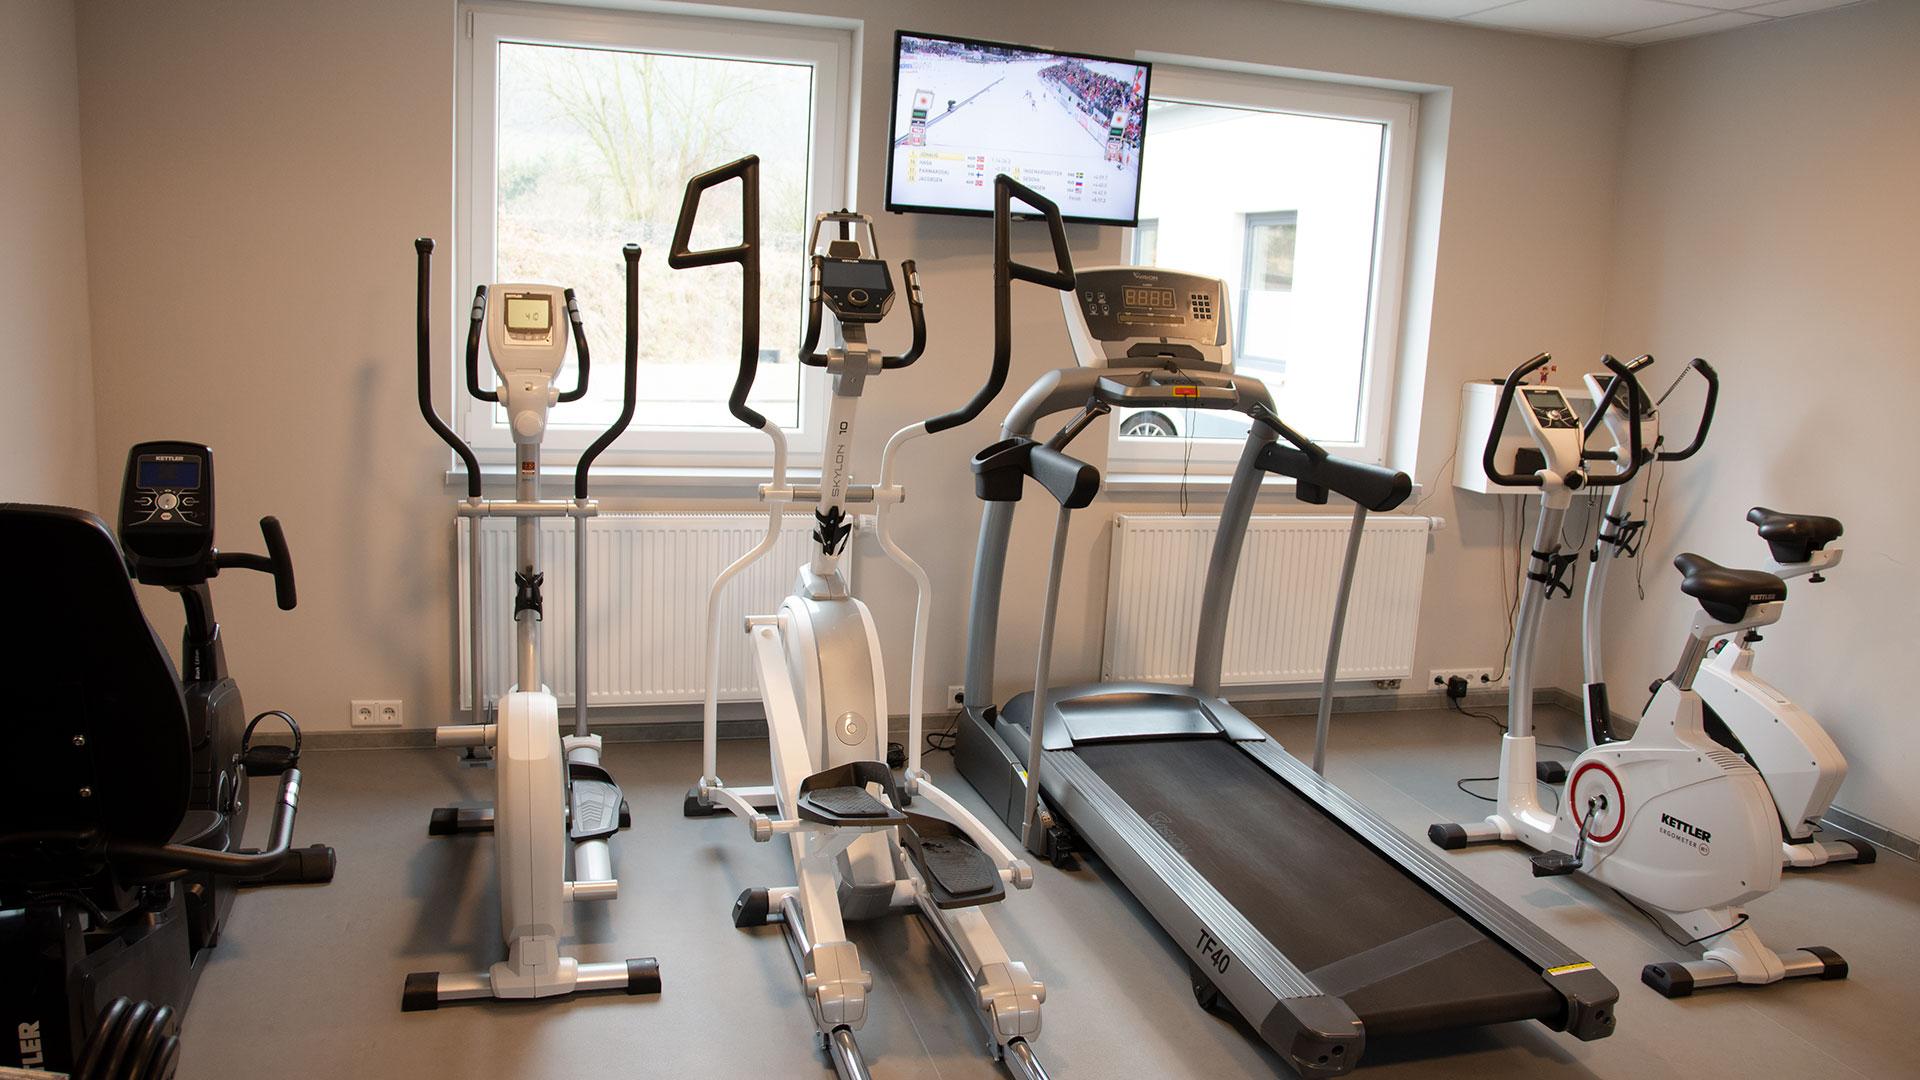 rhoenfit_fitnessstudio_geraete_laufband_fahrrad_bertsch_020319